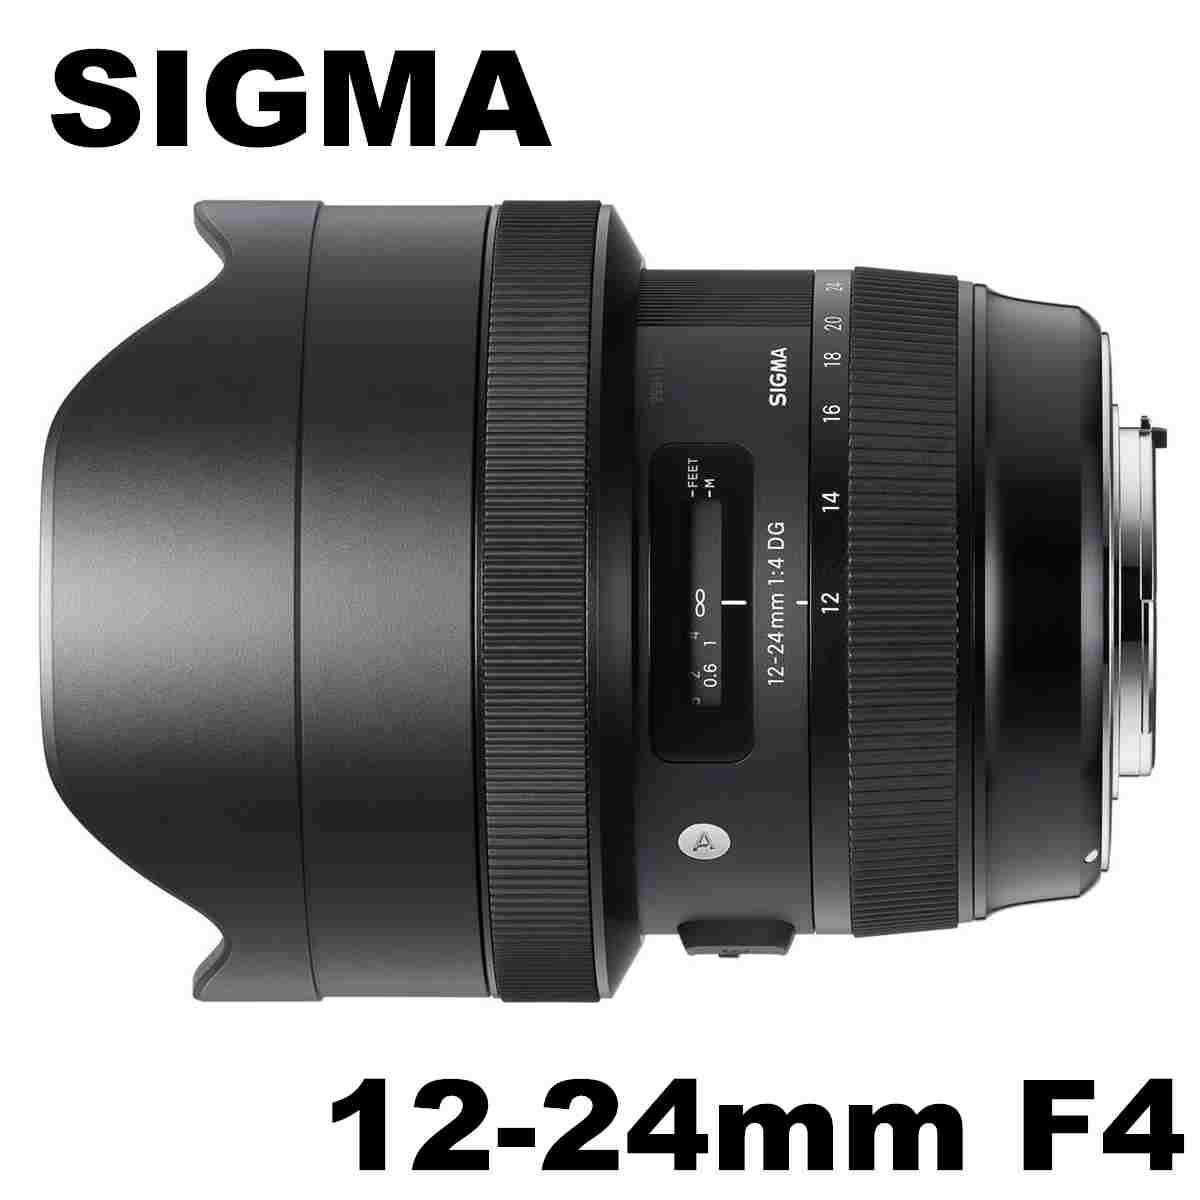 Sigma 12-24mm F4 ART 超廣角鏡頭 全幅/APSC適用 Nikon接環 公司貨 3年保固